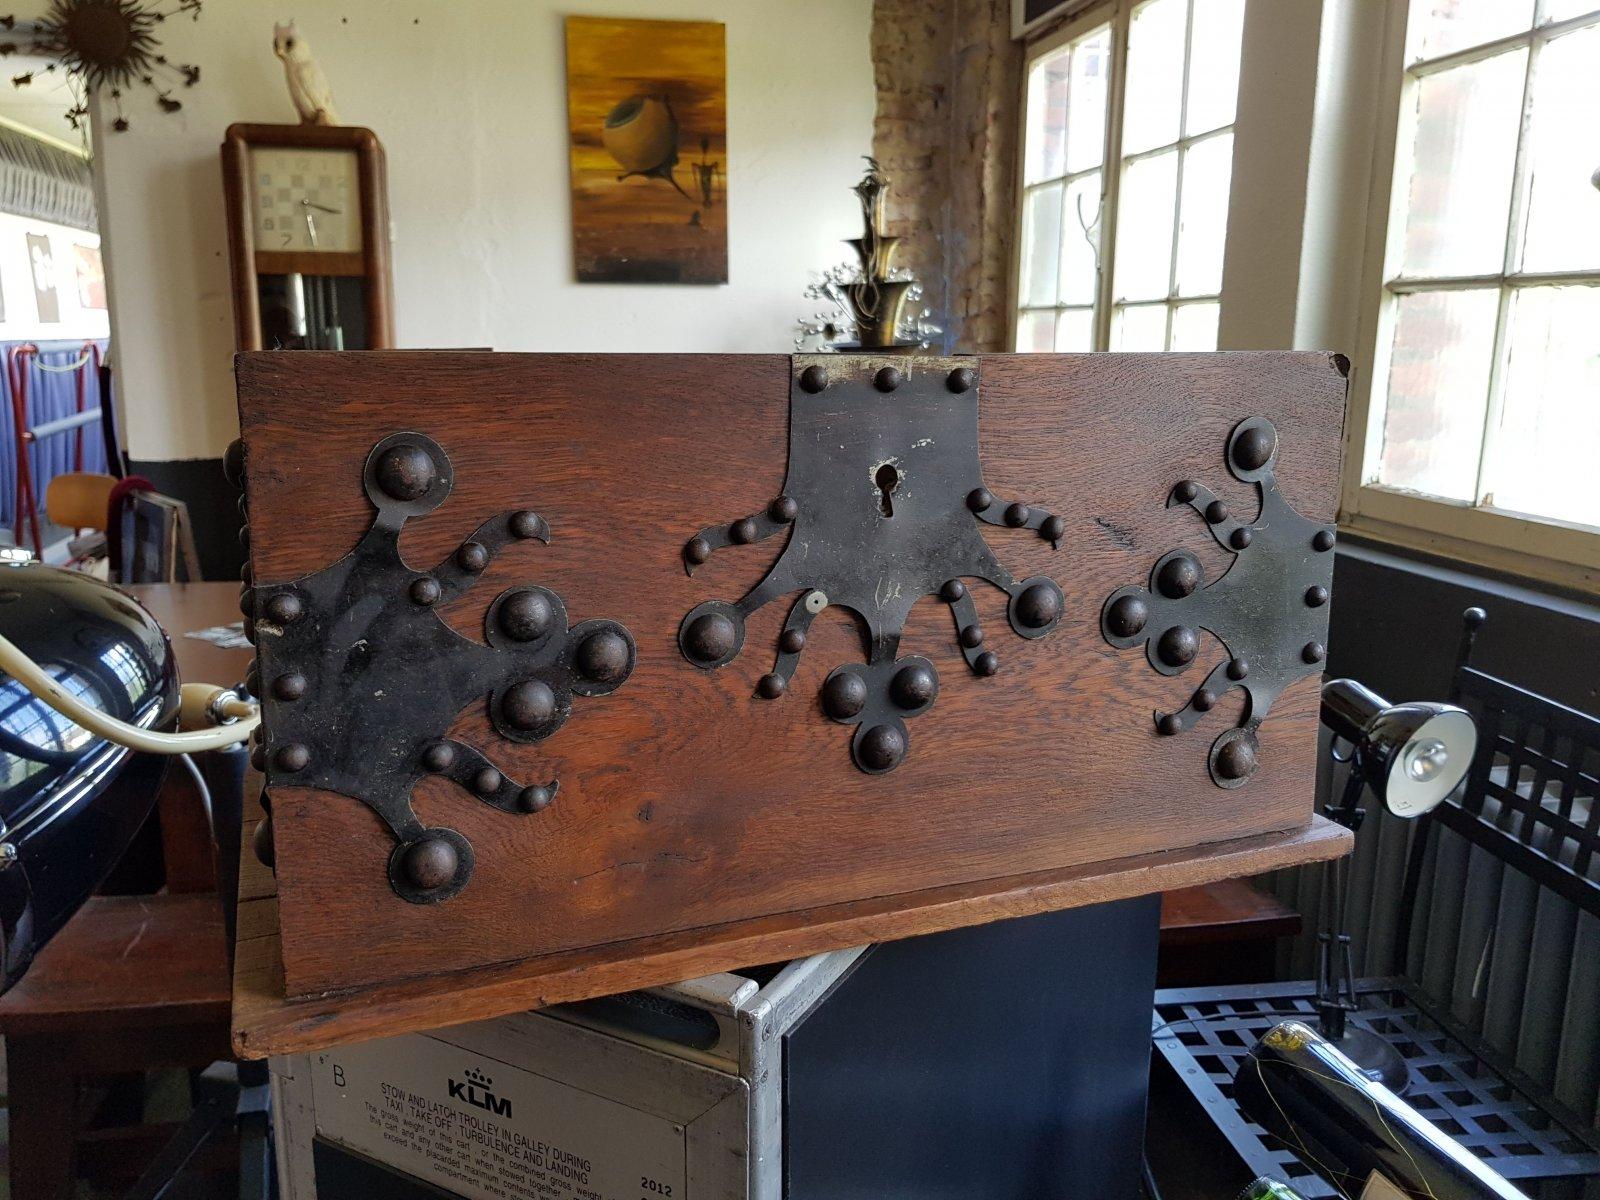 antik truhe kiste eisenbeschl ge holz massiv als schublade oder couchtisch ebay. Black Bedroom Furniture Sets. Home Design Ideas